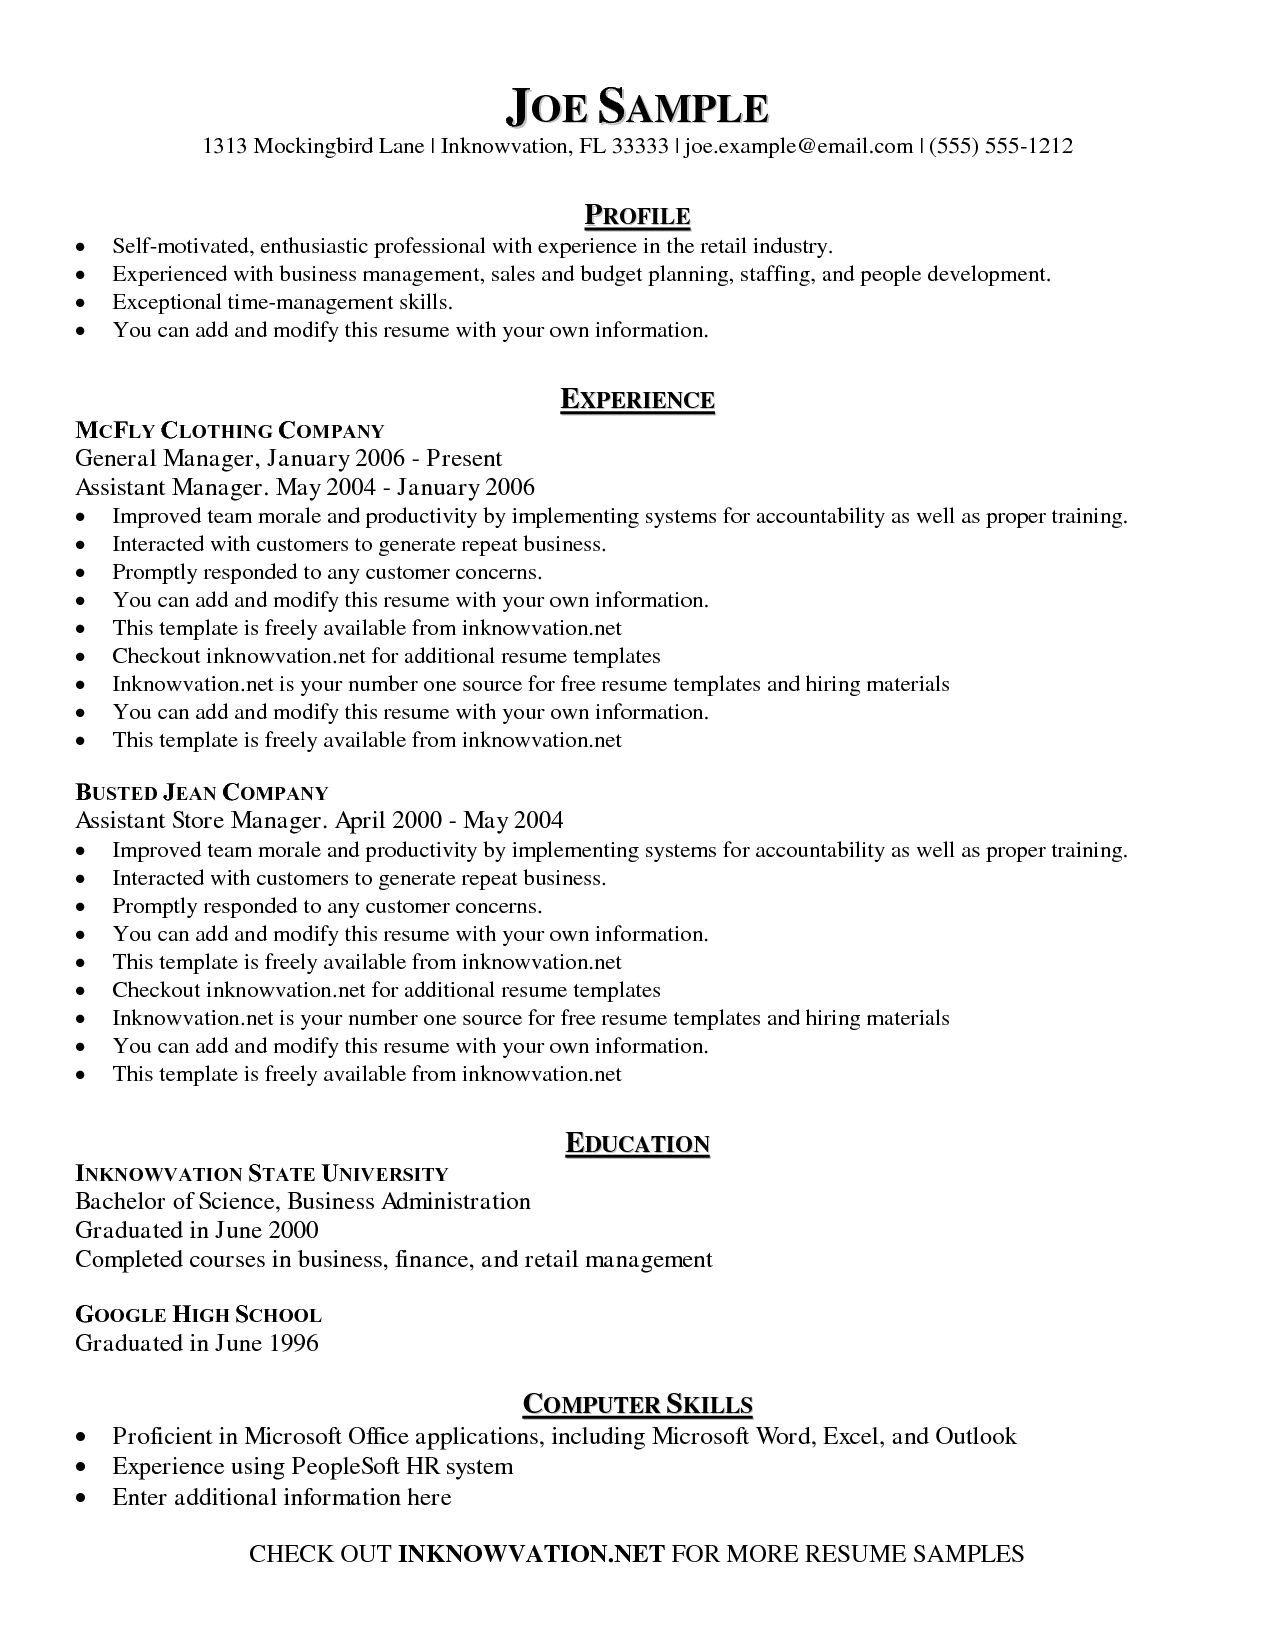 Resume Format Checker Sample Resume Templates Resume